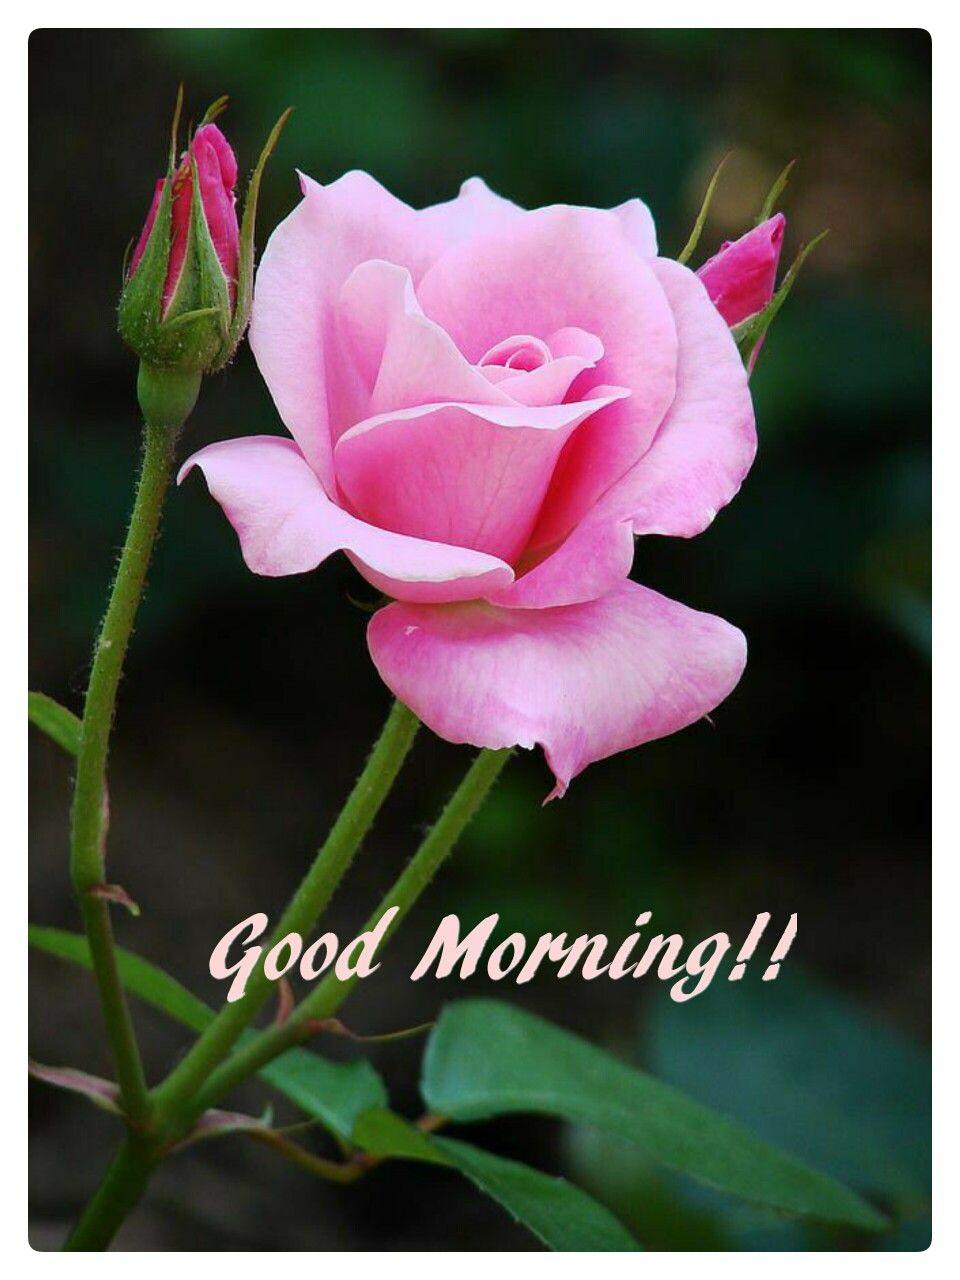 Good Morning Good Morninghave A Wonderful Day Pinterest